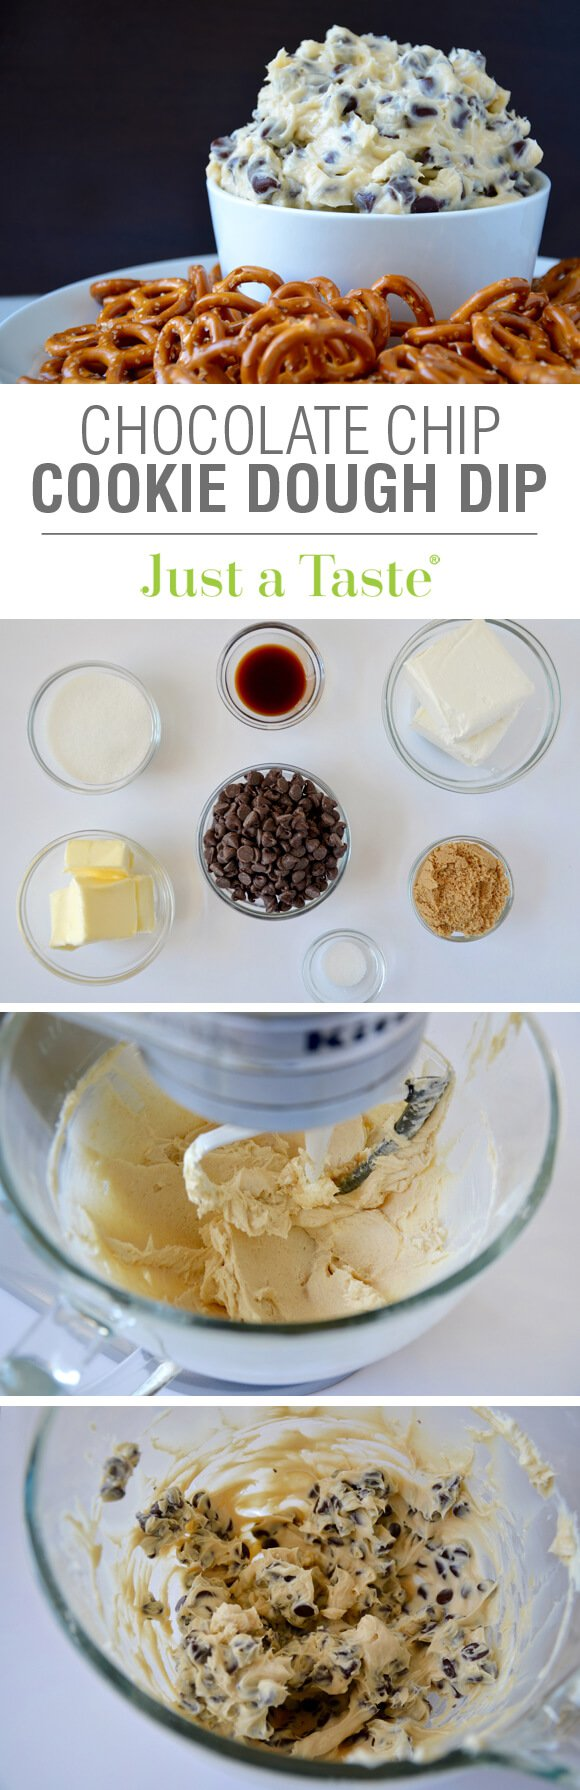 Chocolate Chip Cookie Dough Dip   Recipe   Cookie dough dip ...